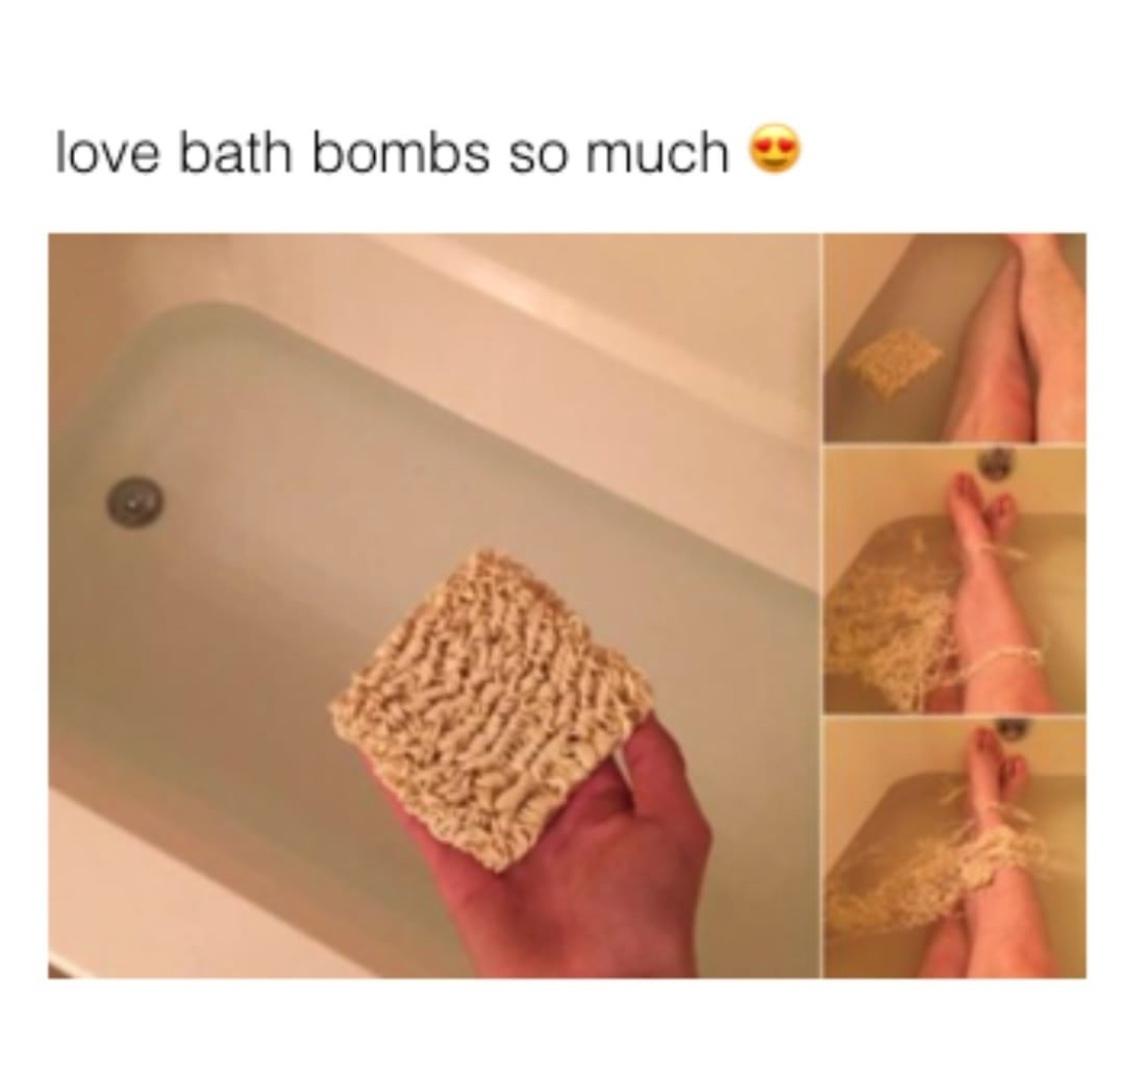 you gotta love em - meme